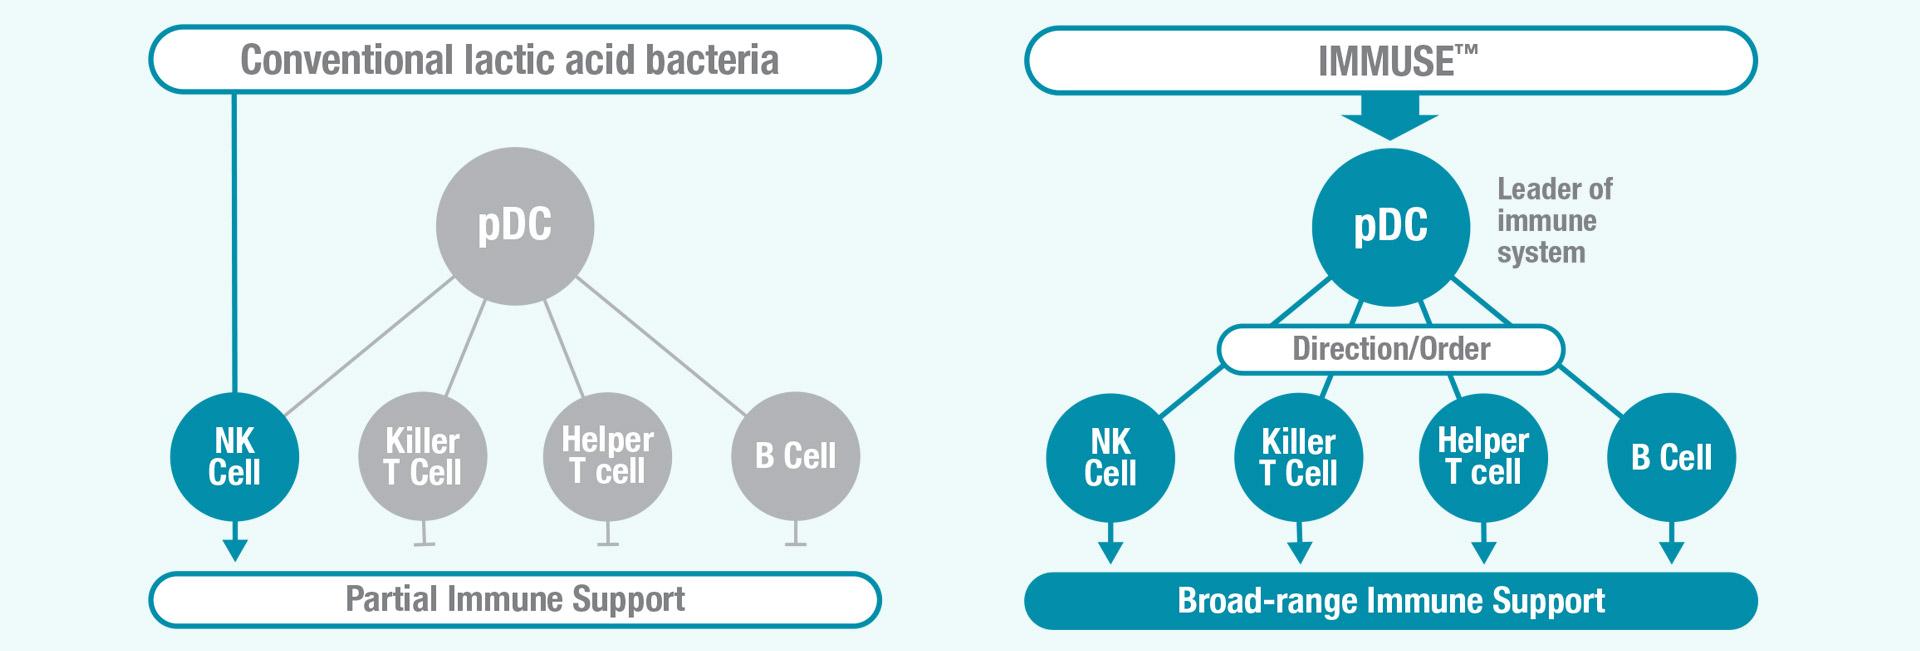 Immuse vs. Conventional Lactic Acid Bacteria